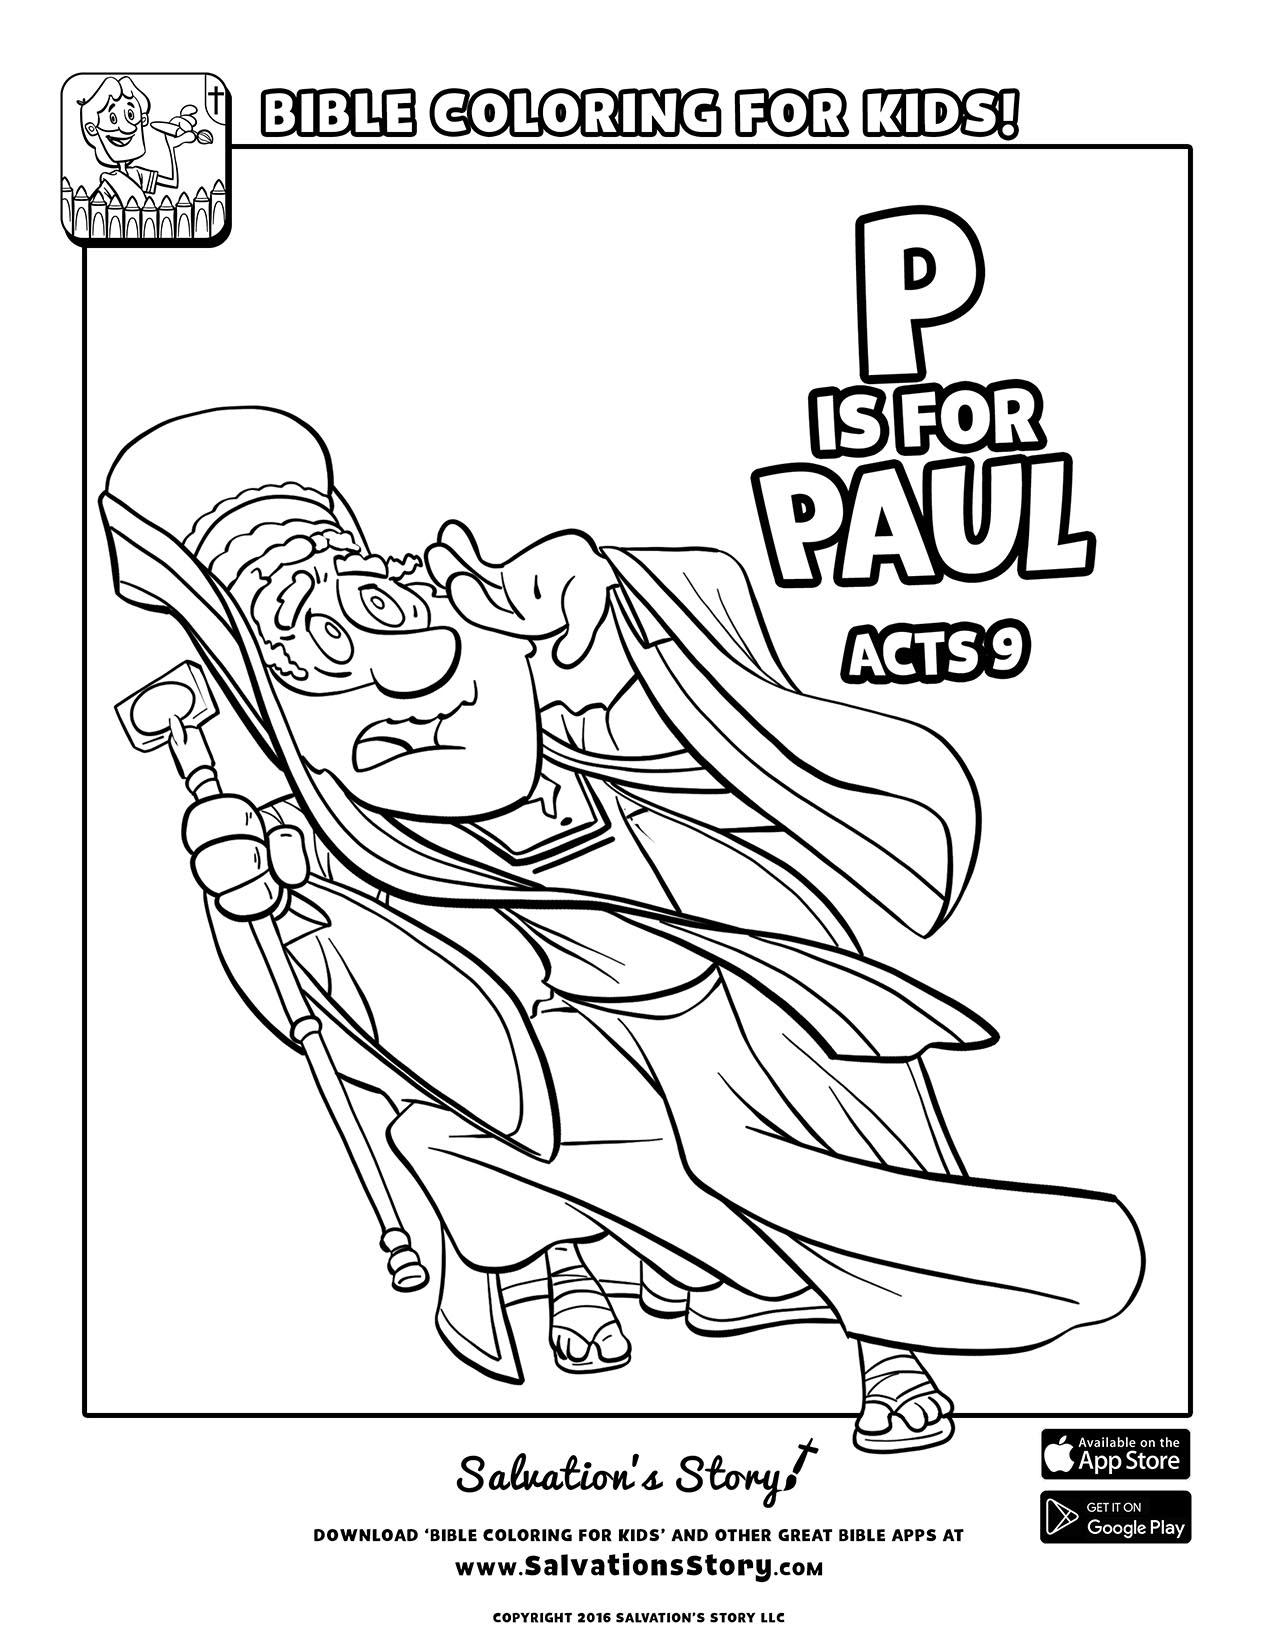 P is for Paul.jpg